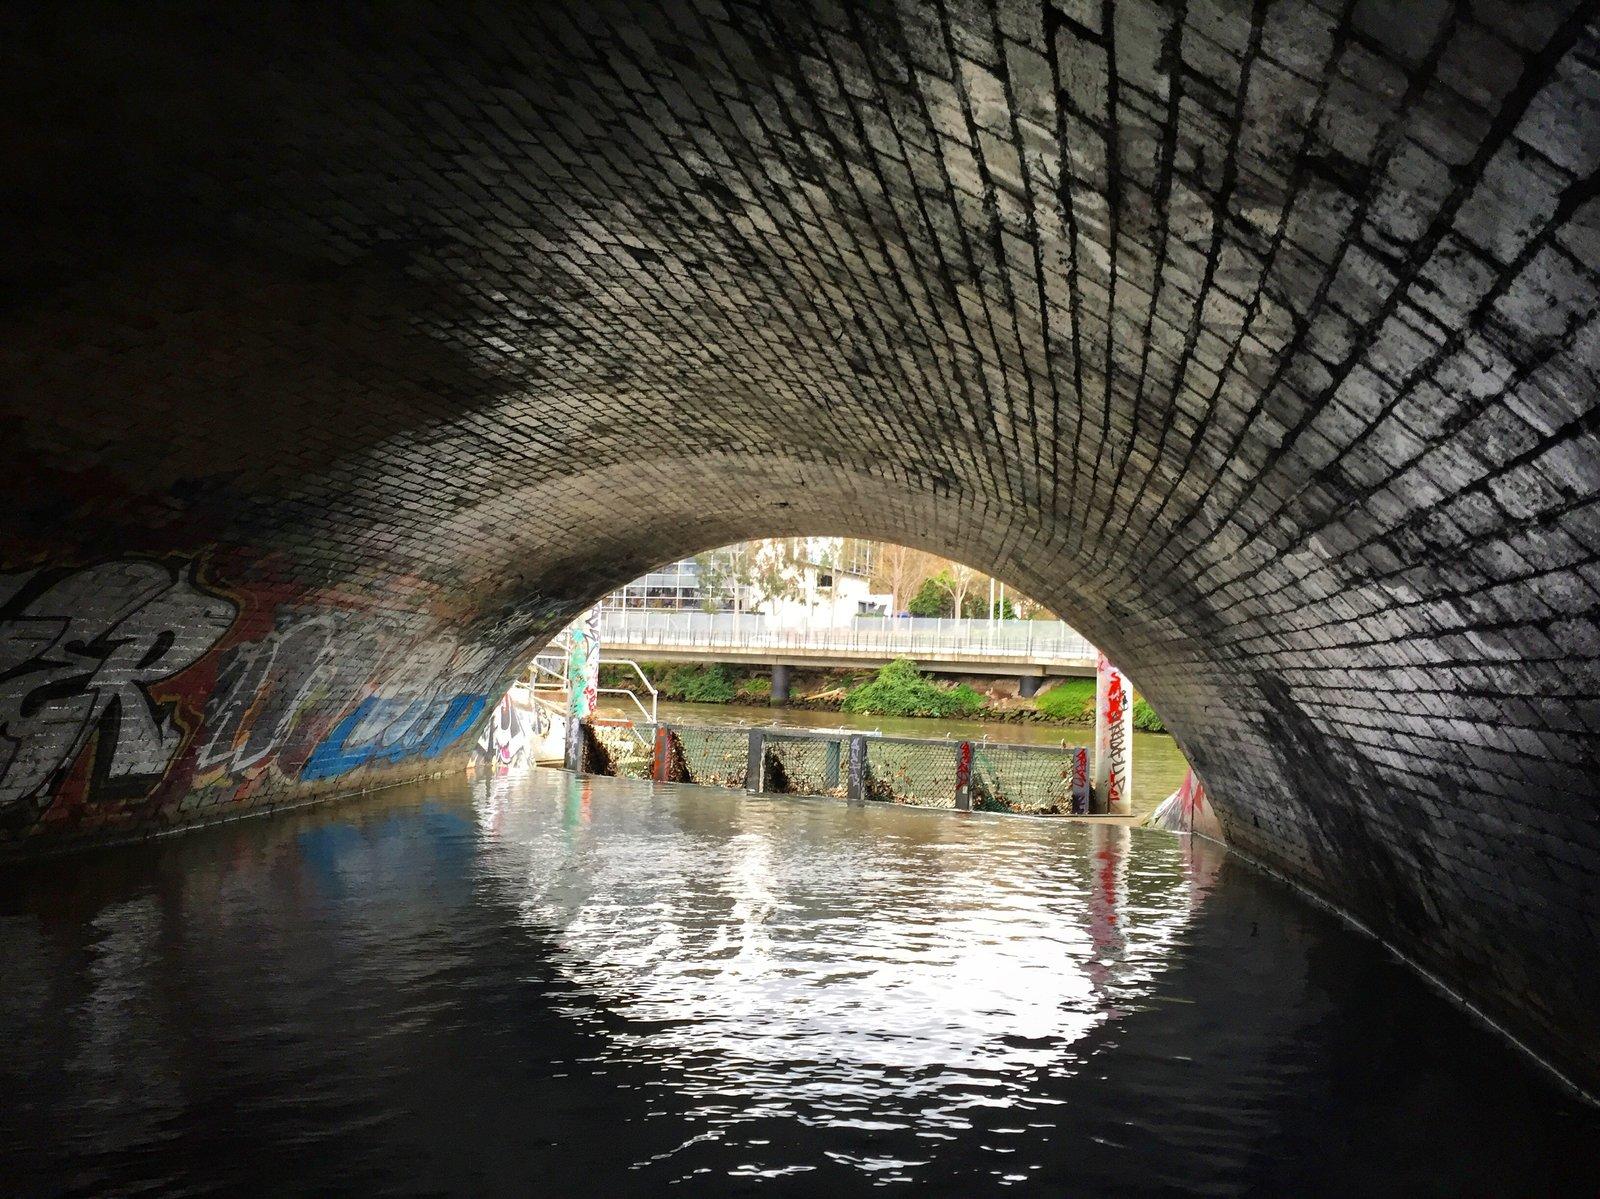 Melbourne storm tunnels